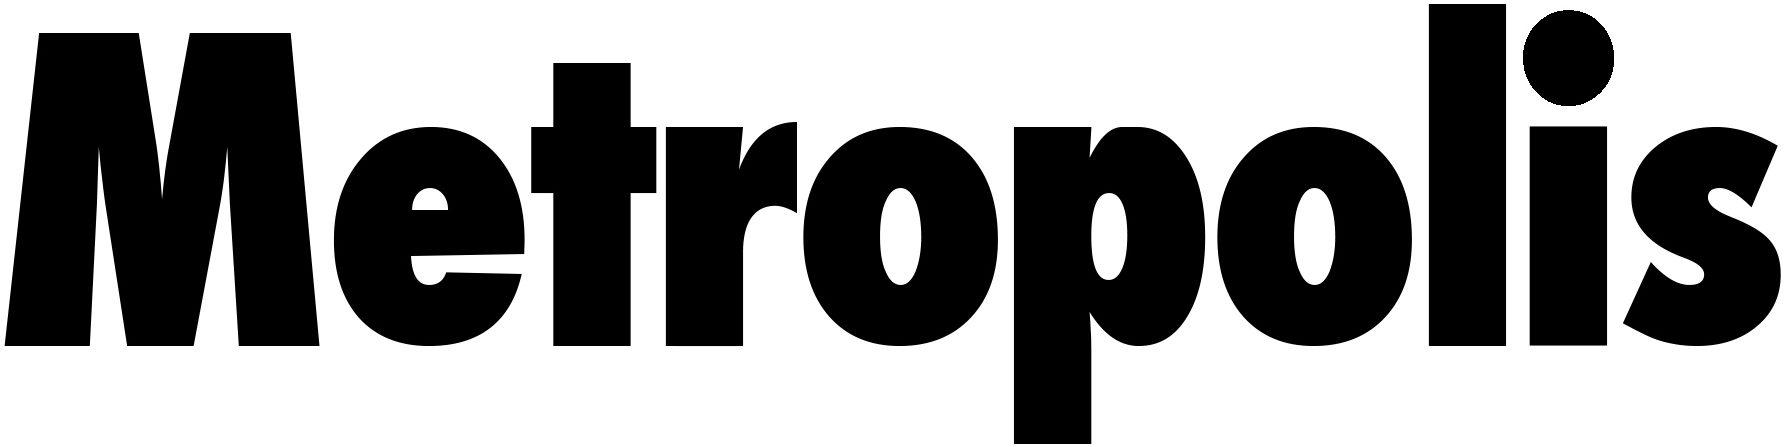 Metropolisweb